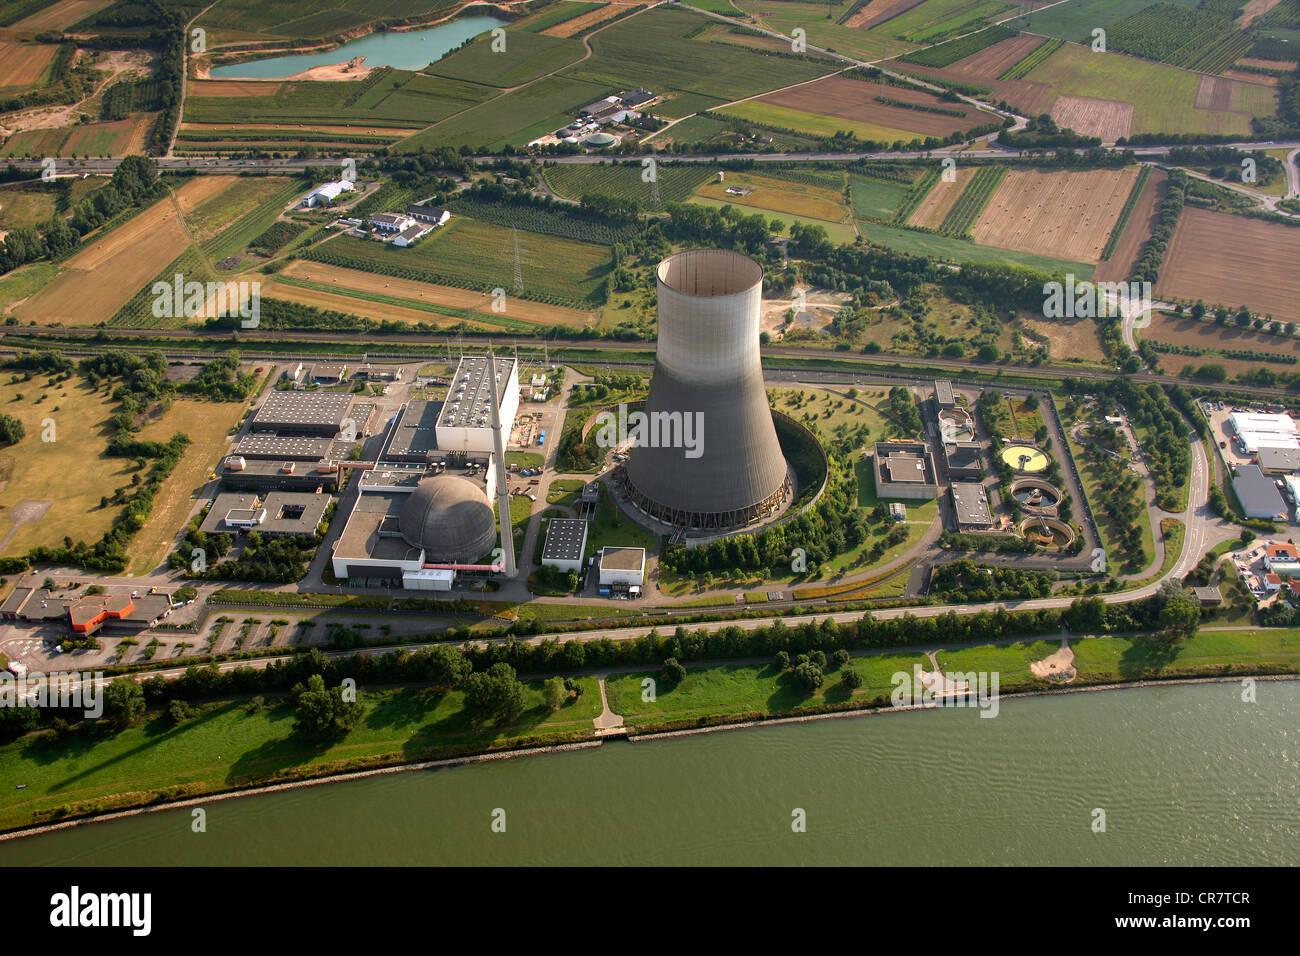 Aerial view, Muelheim-Kaerlich Nuclear Power Plant on the Rhine River, near Koblenz, Rhineland-Palatinate, Germany, - Stock Image